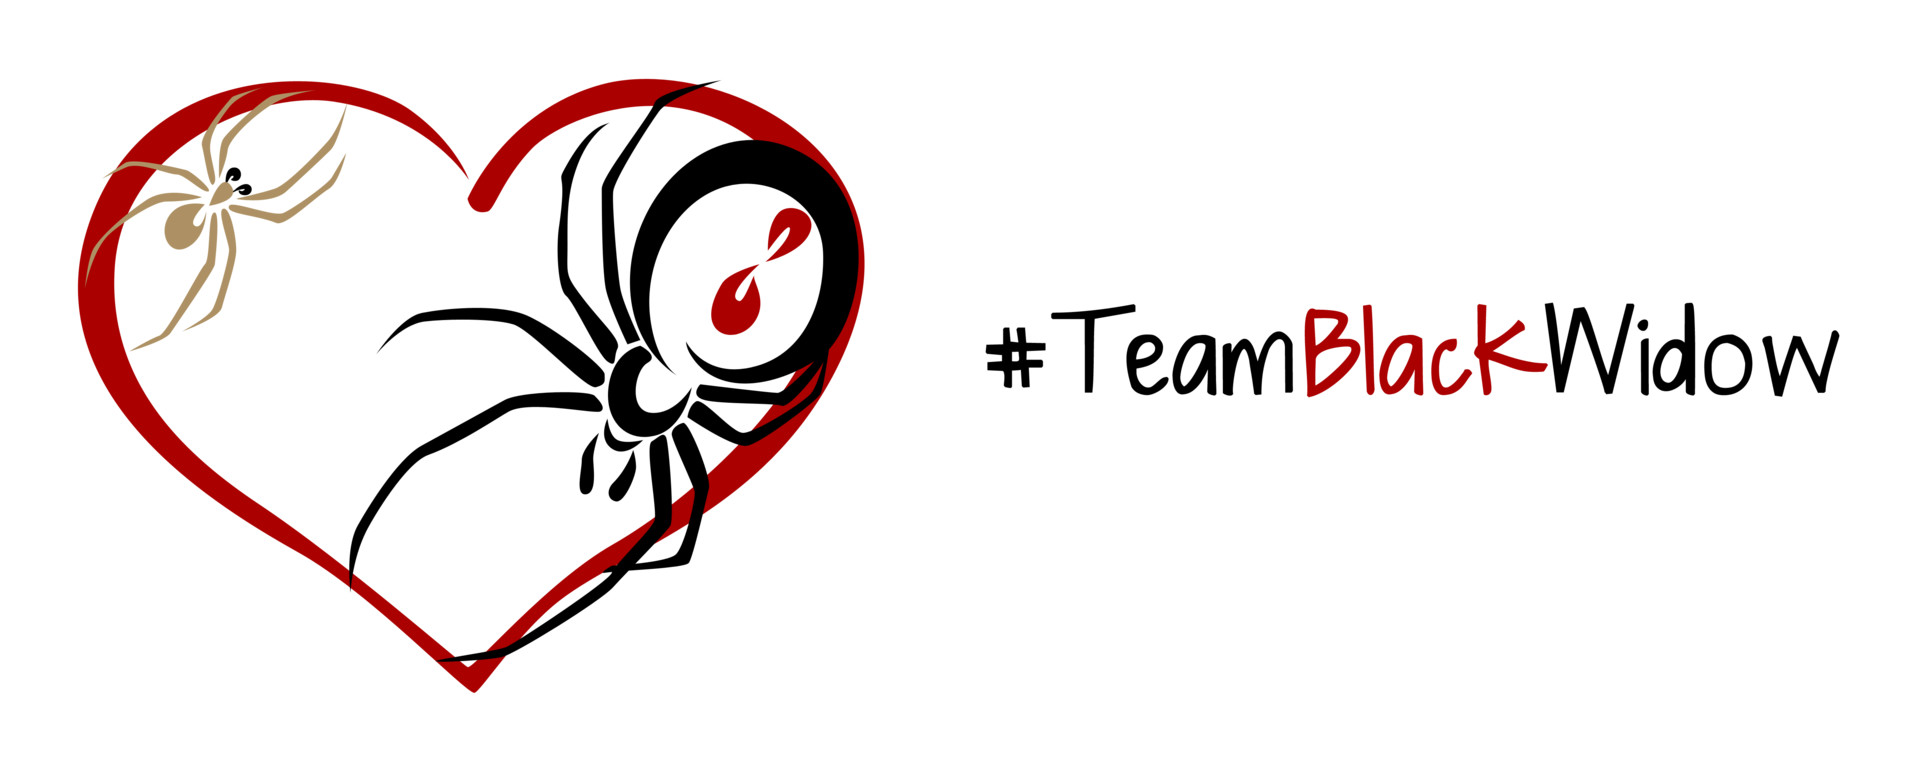 Artstation Team Black Widow Logo Design Peggy Muddles